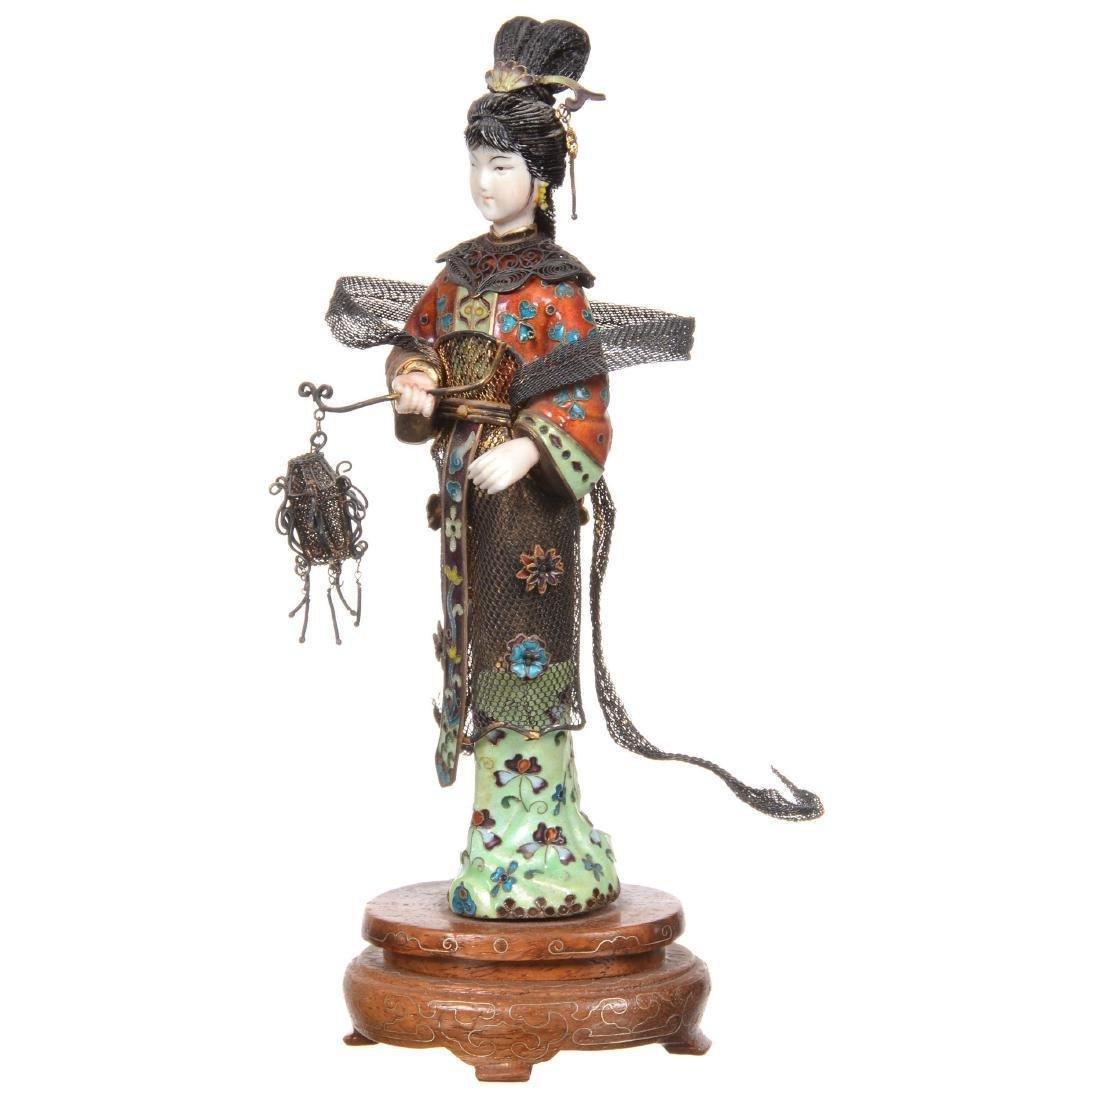 Chinese Silver and Enamel Female Figure Holding Lantern